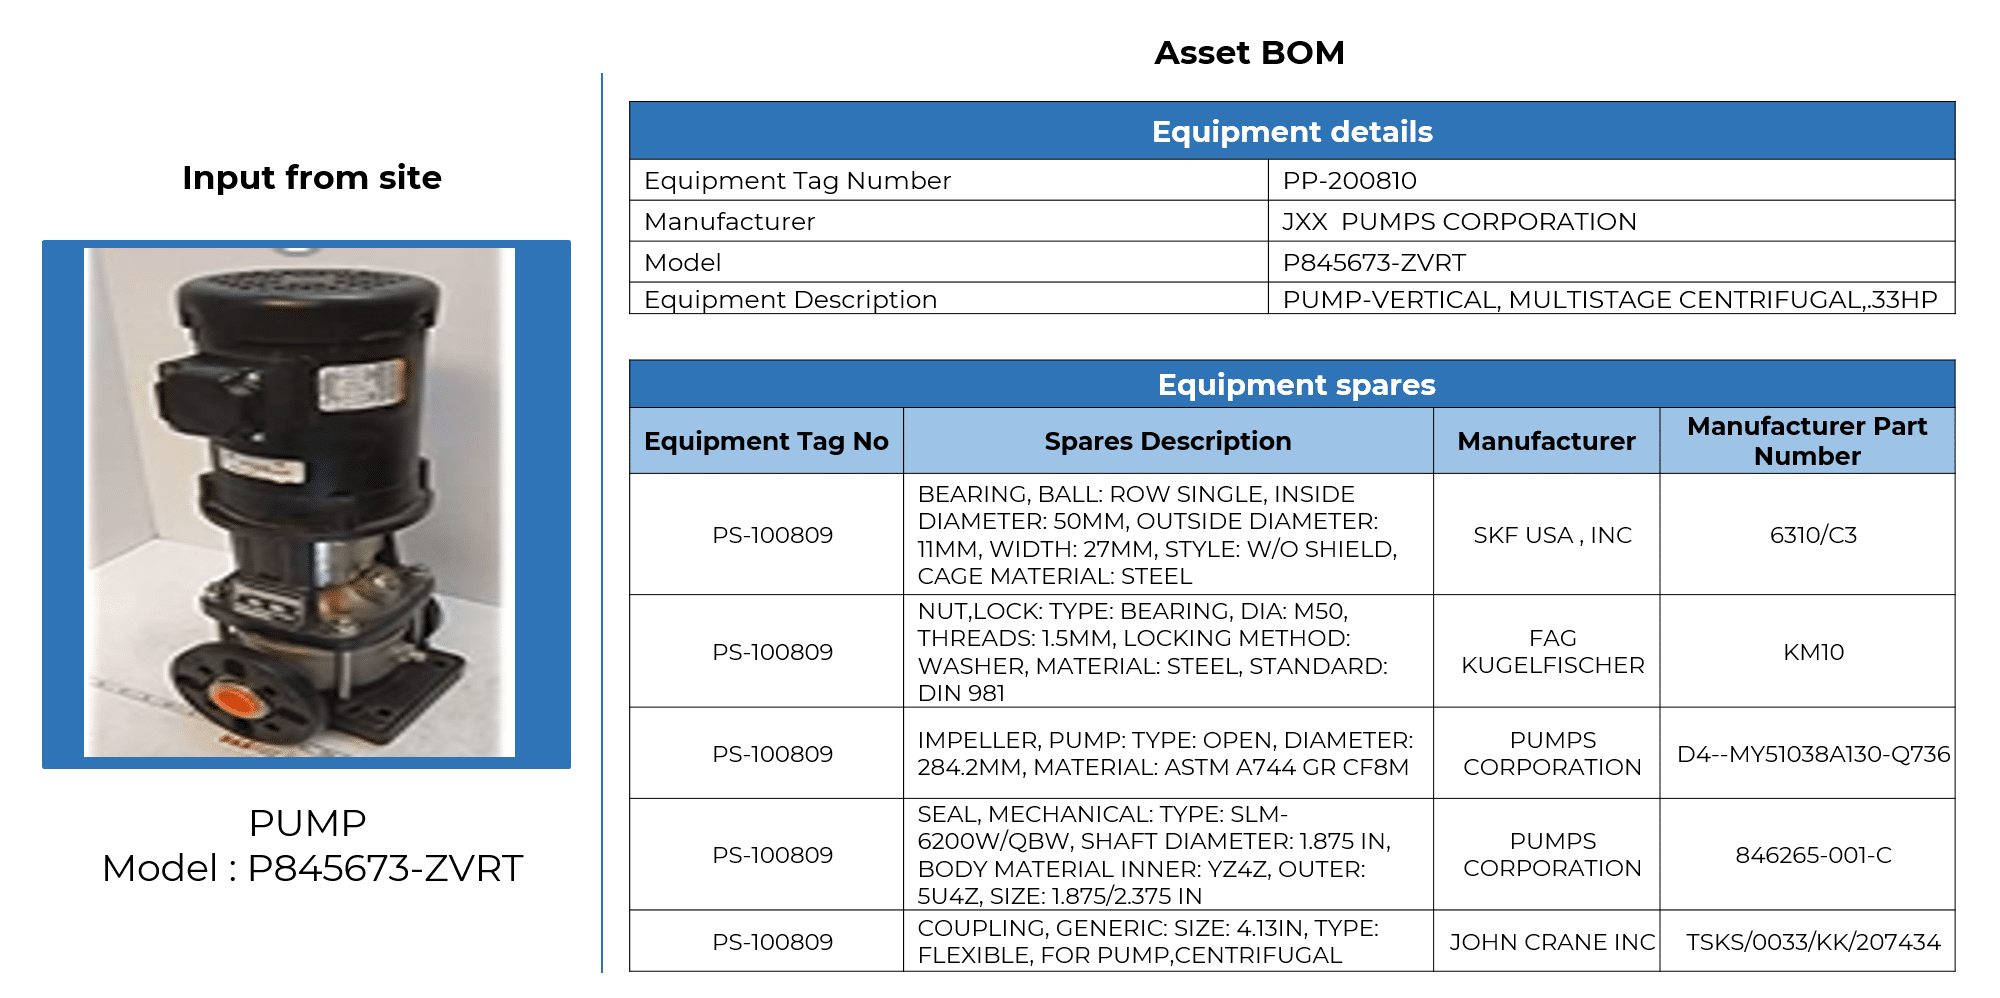 Asset BOM Sample